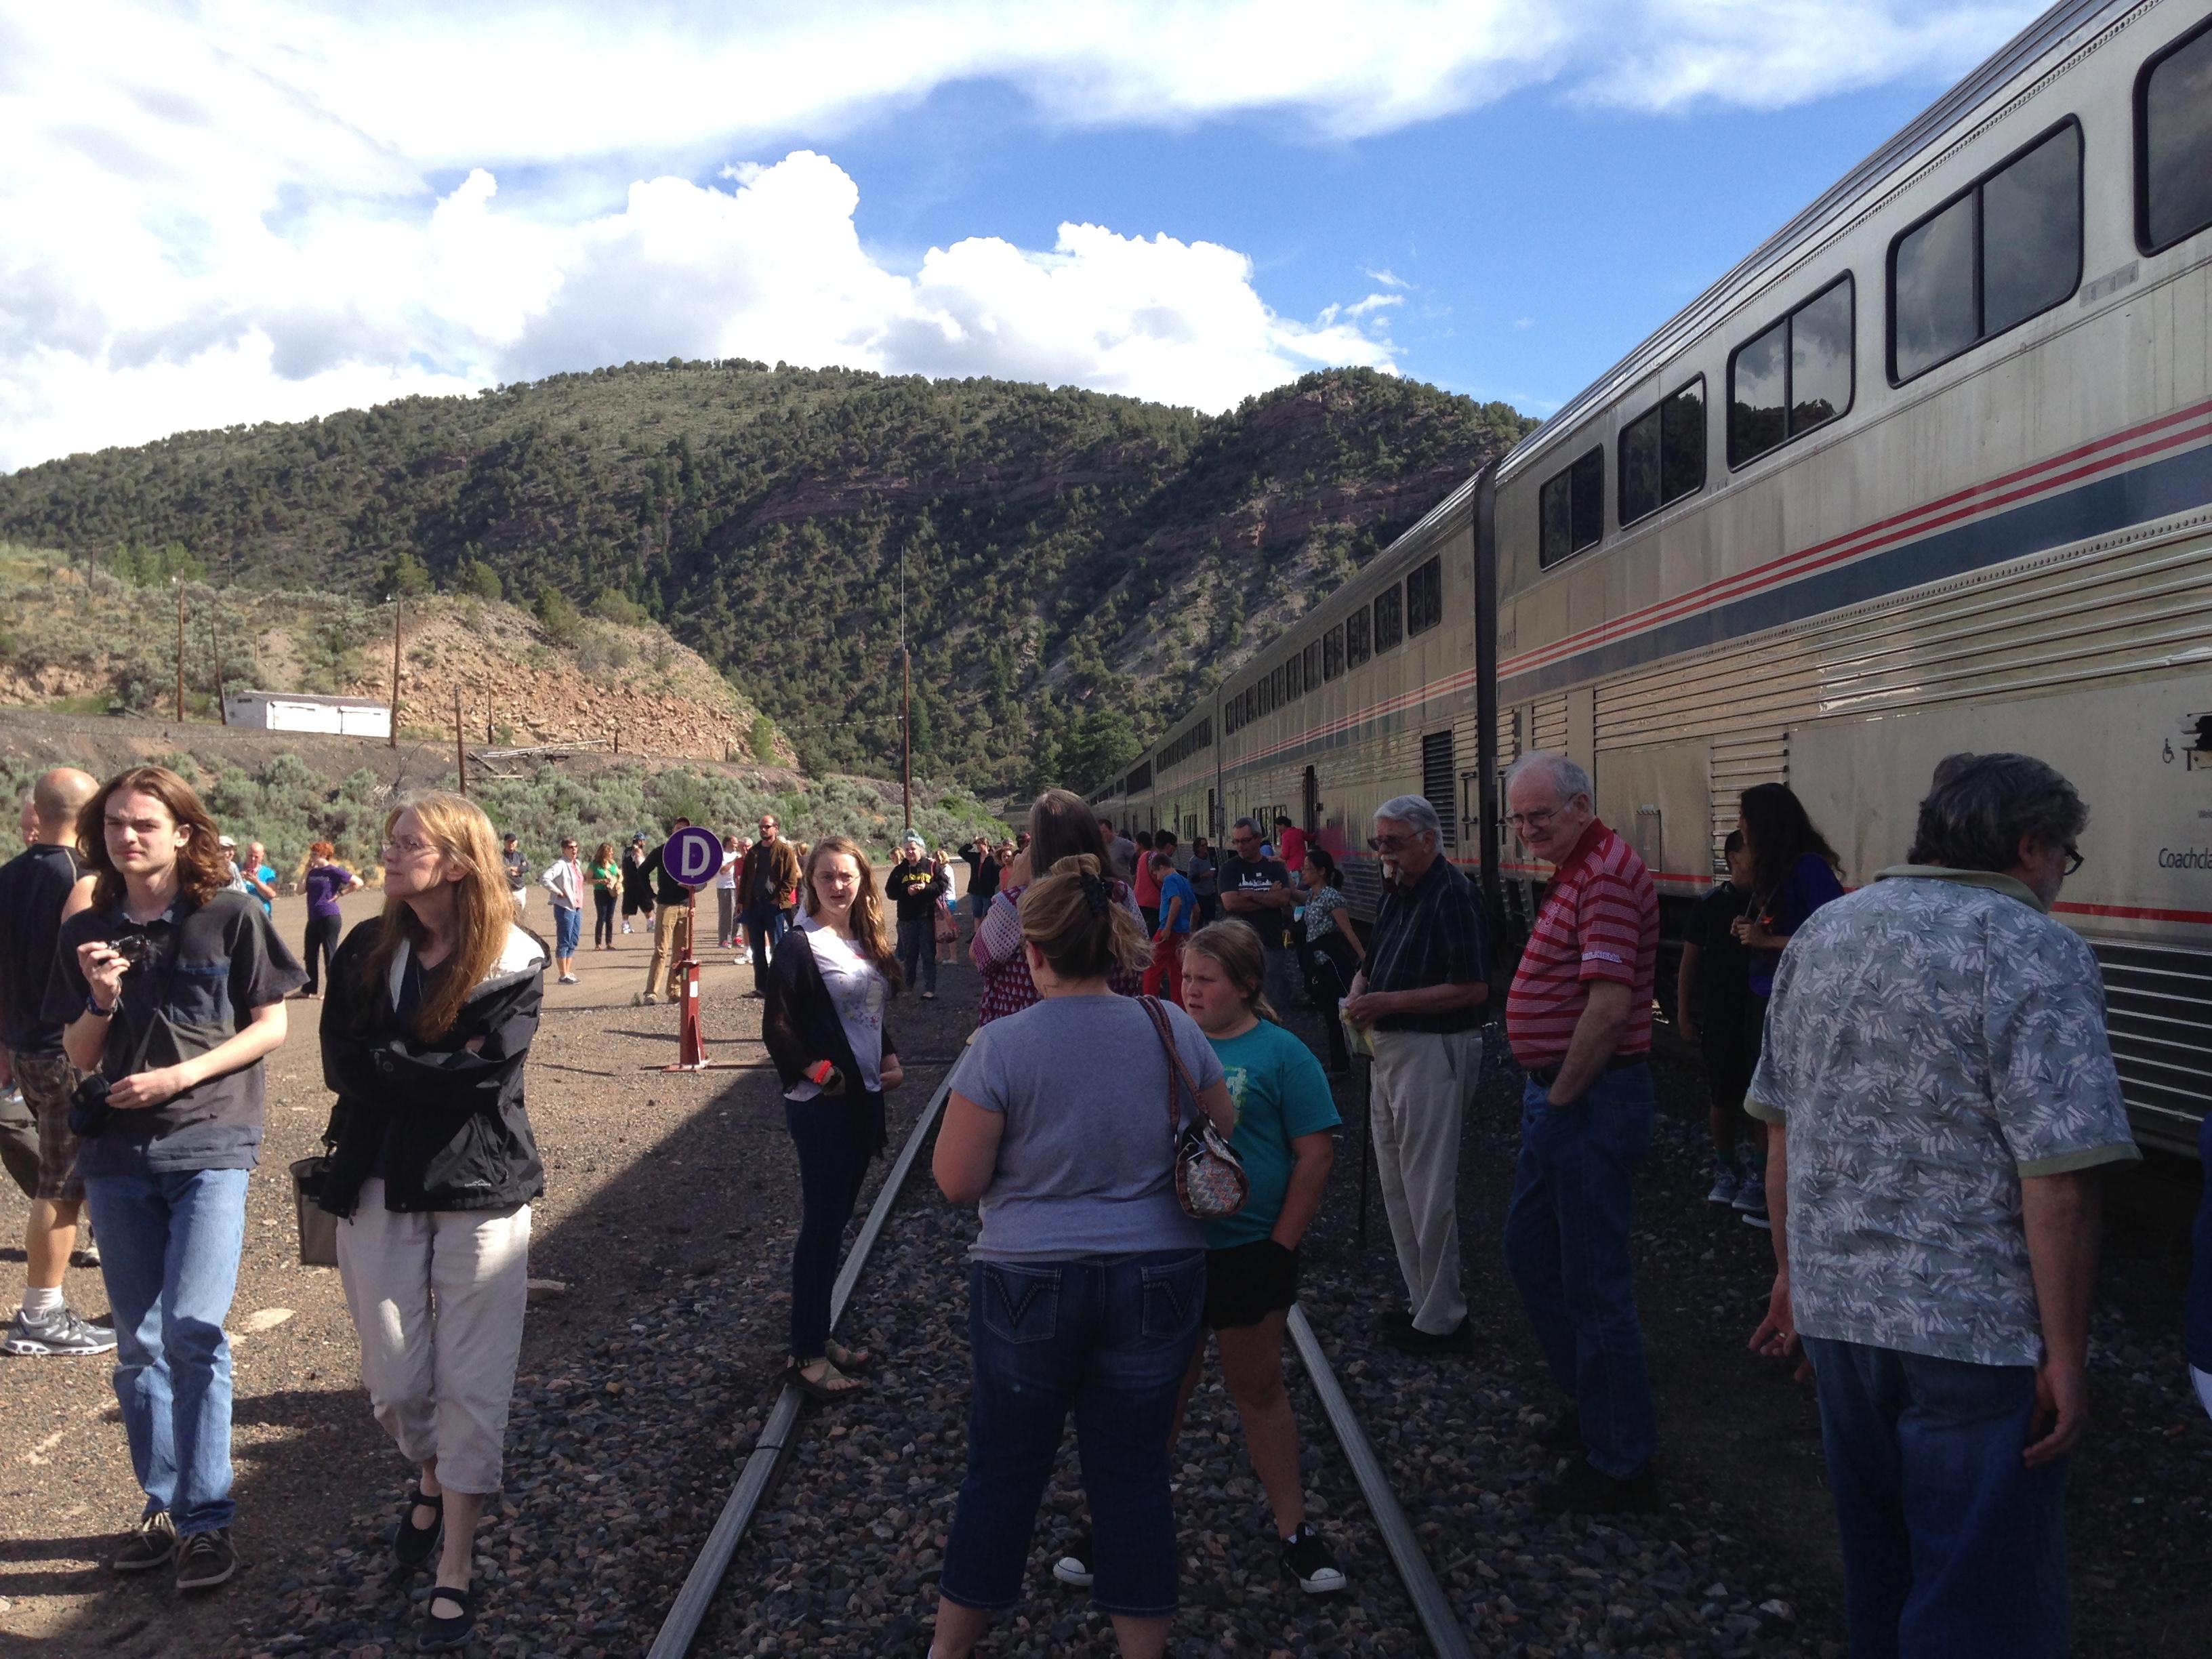 Amtrak Mooning Pictures the great train adventure/nightmare: denver to glenwood